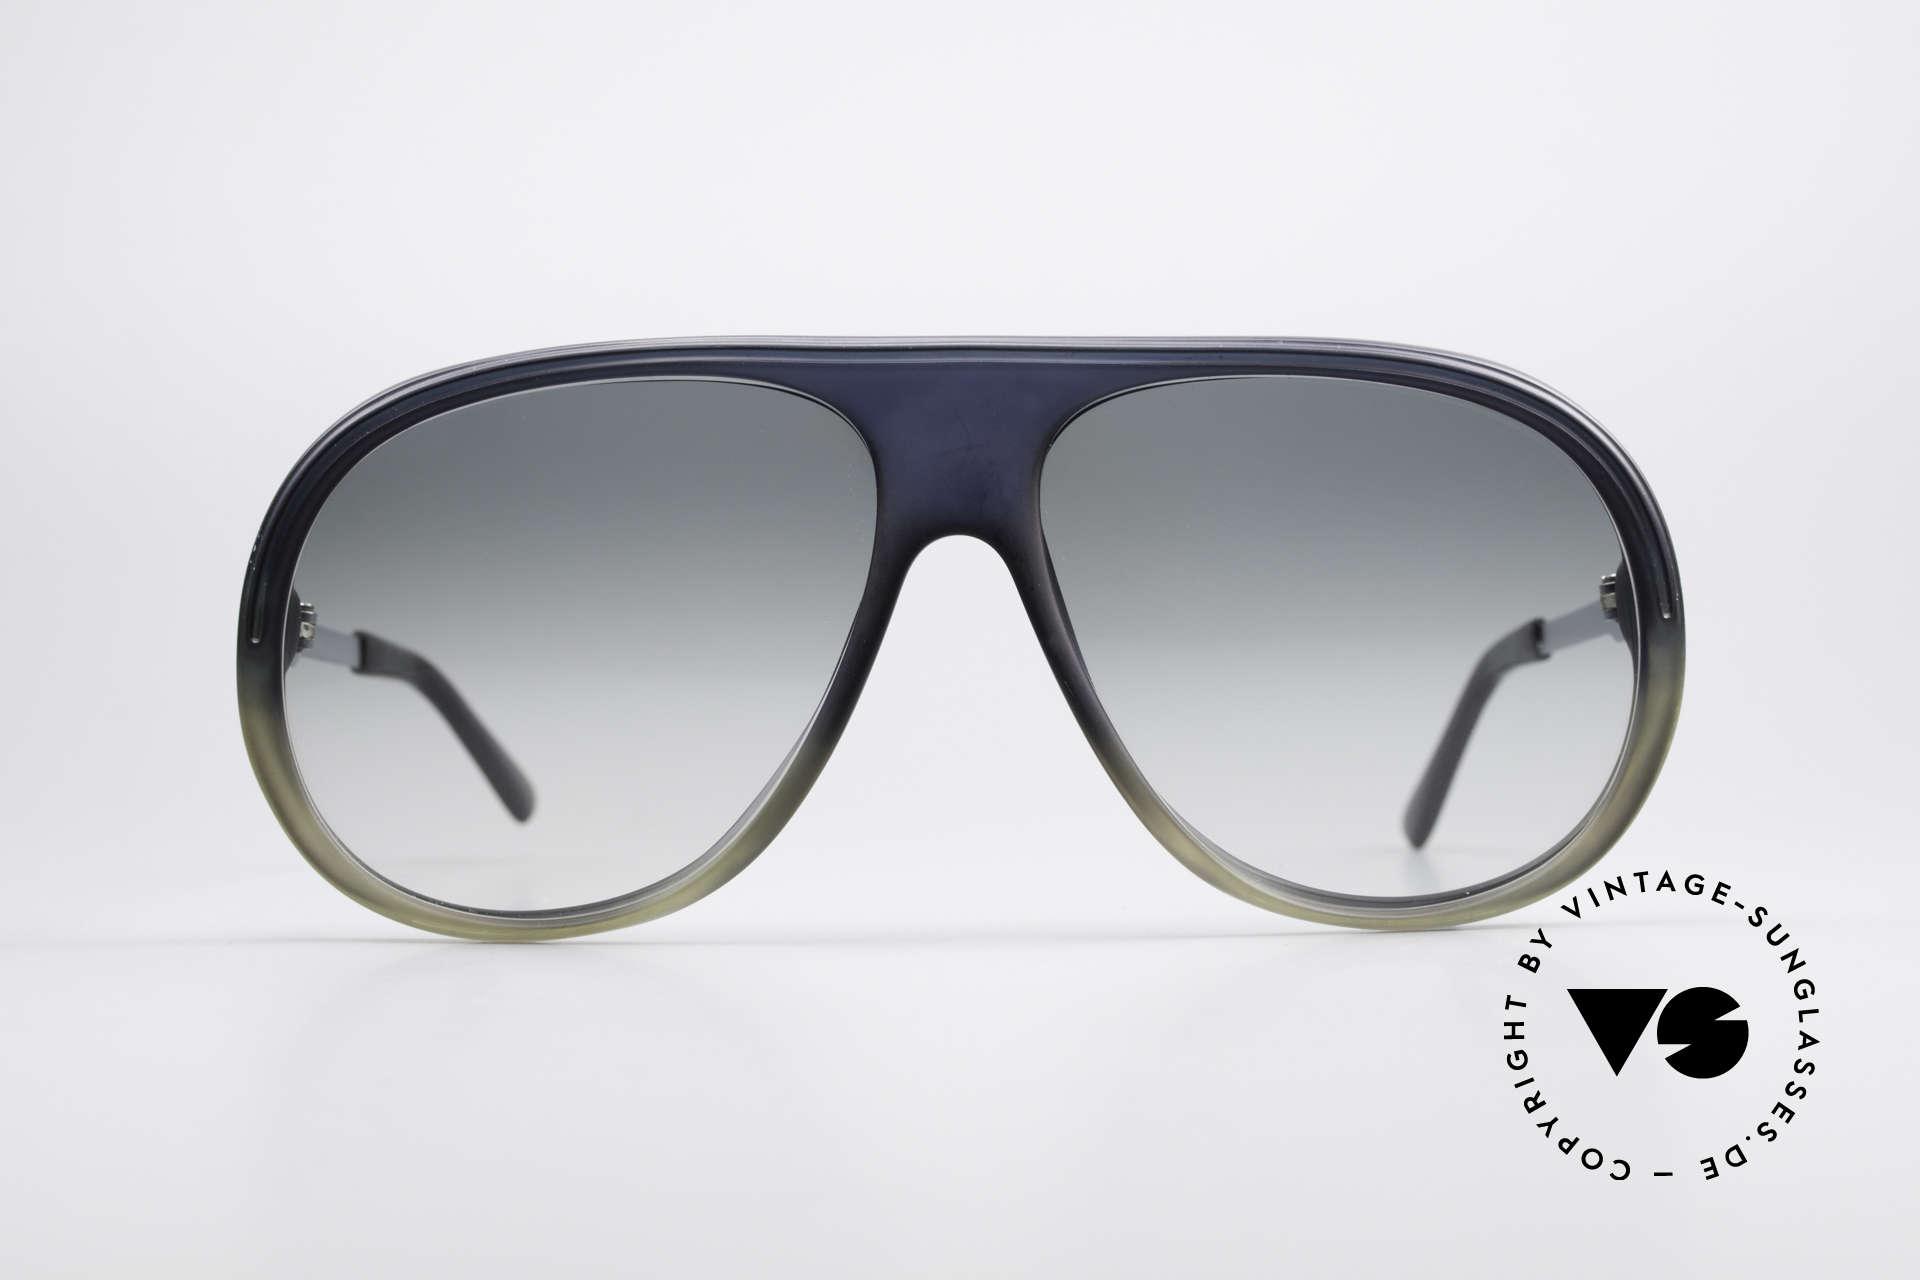 1df75ce962de3 Sunglasses Carrera 5524 Optyl Sunglasses XXL Shades